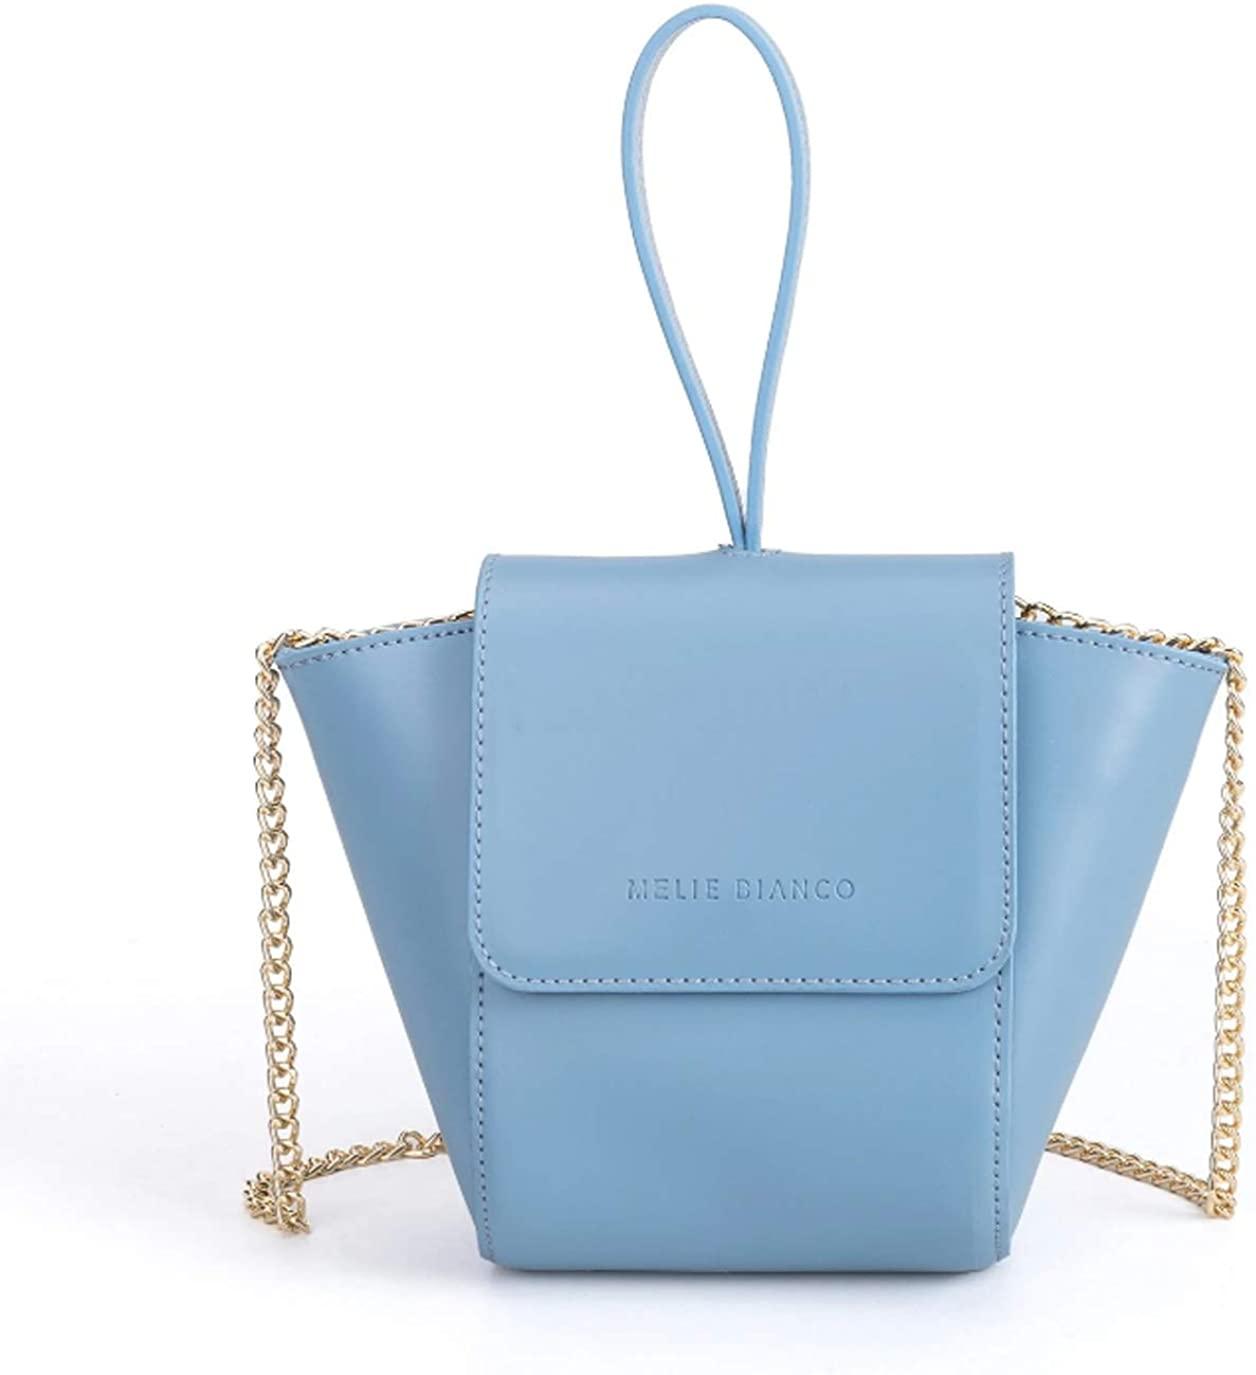 Melie Bianco Adele Vegan Leather Ring Wristlet Crossbody Bag, Blue